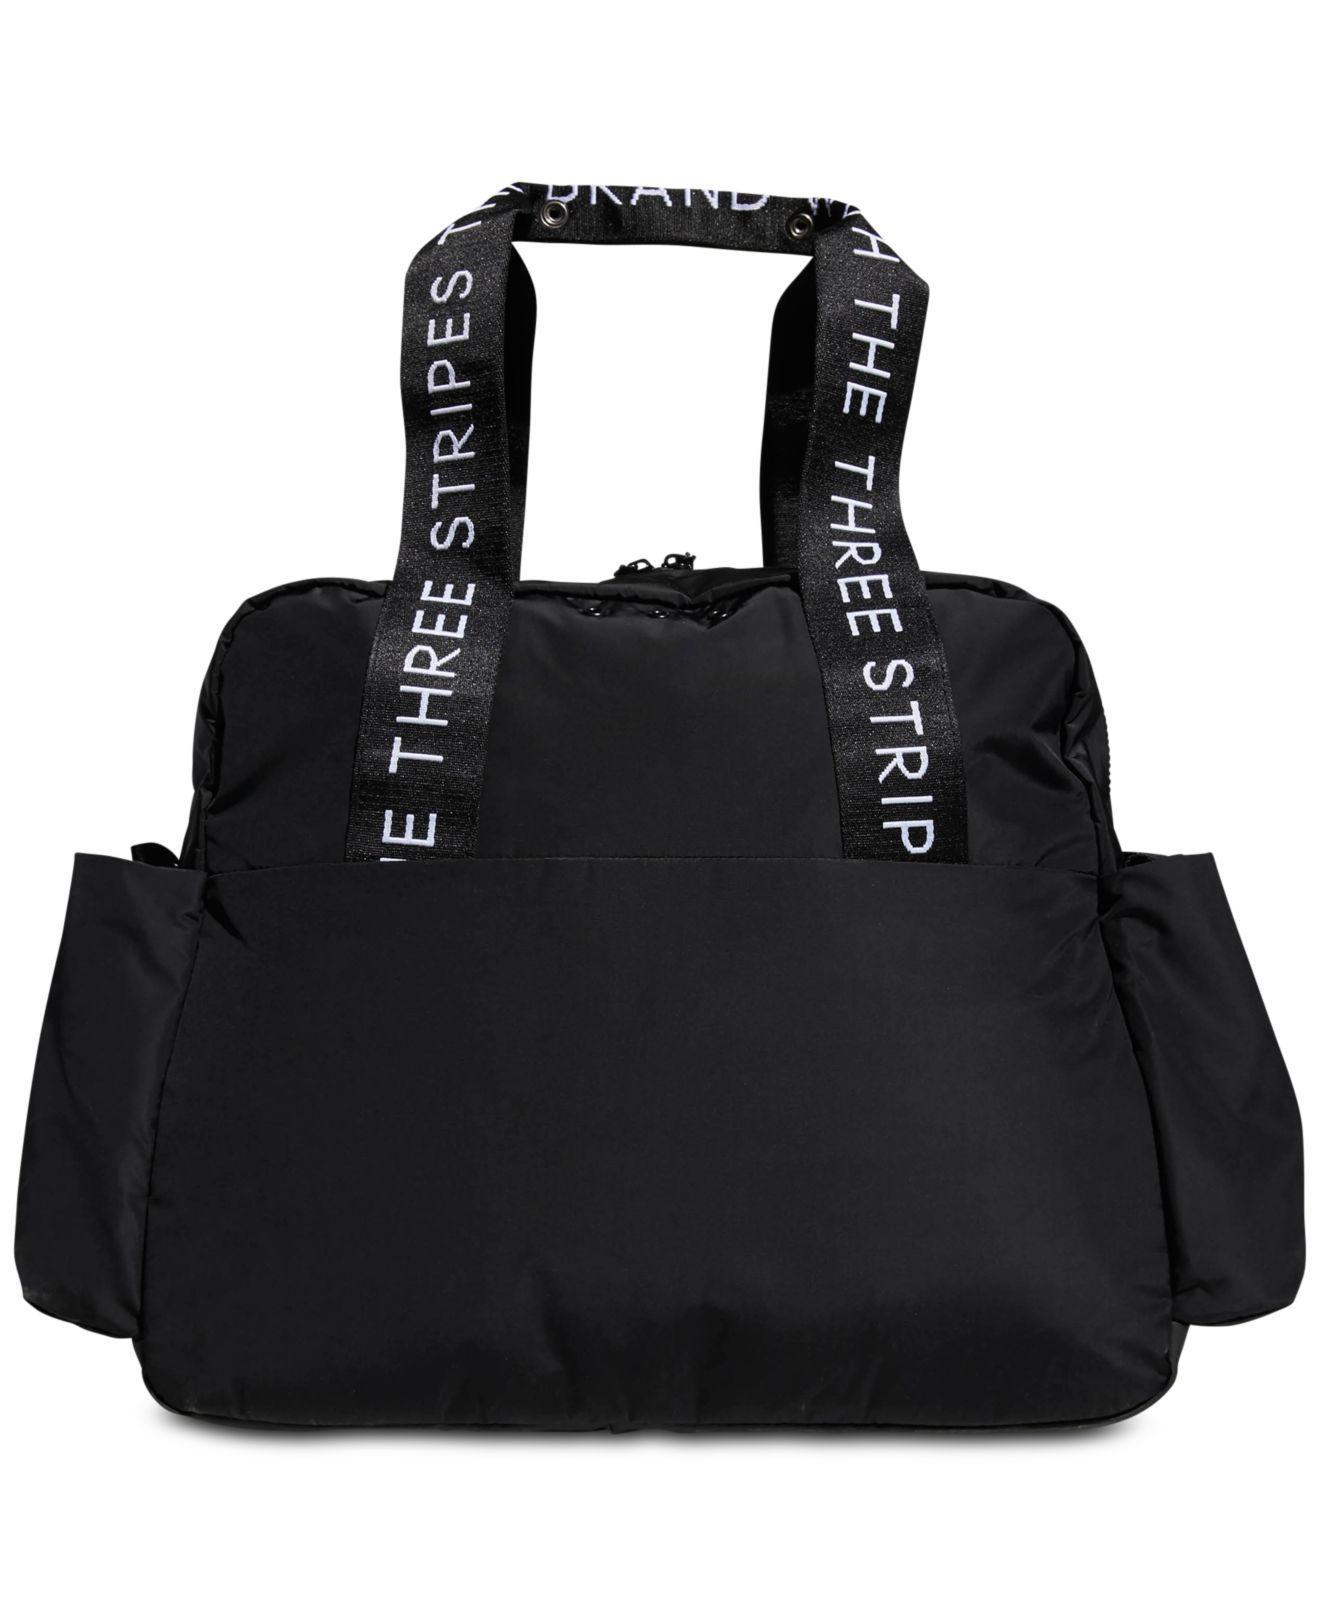 e1cf32d8fbc4 adidas Sport To Street Tote Bag in Black - Lyst